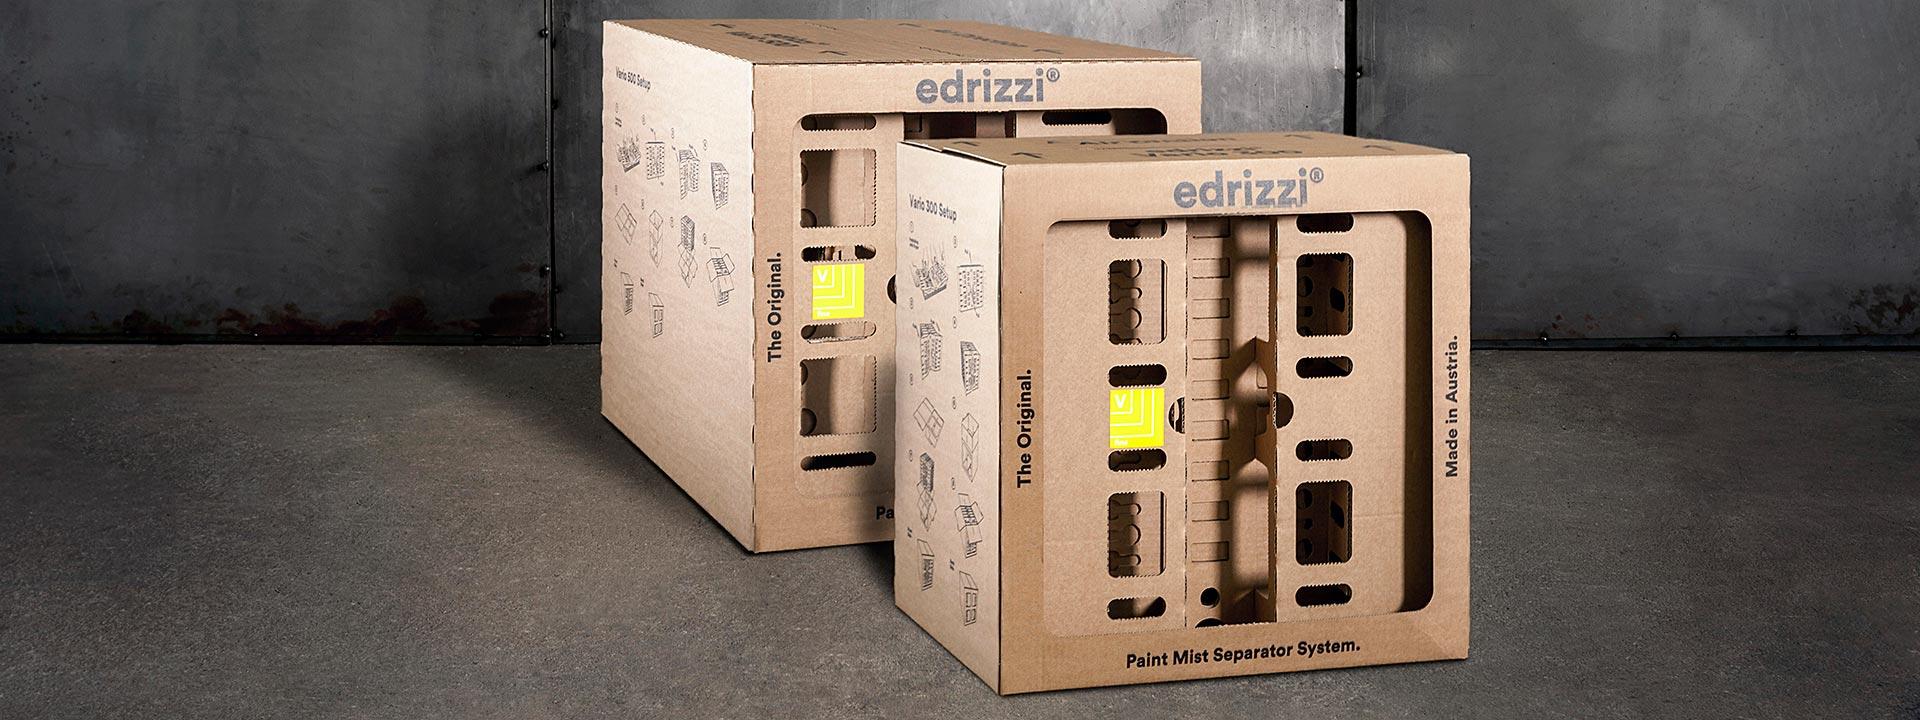 Vario Paint Mist Separator Pr Series Inlet Boxes With Built In Circuit Breaker